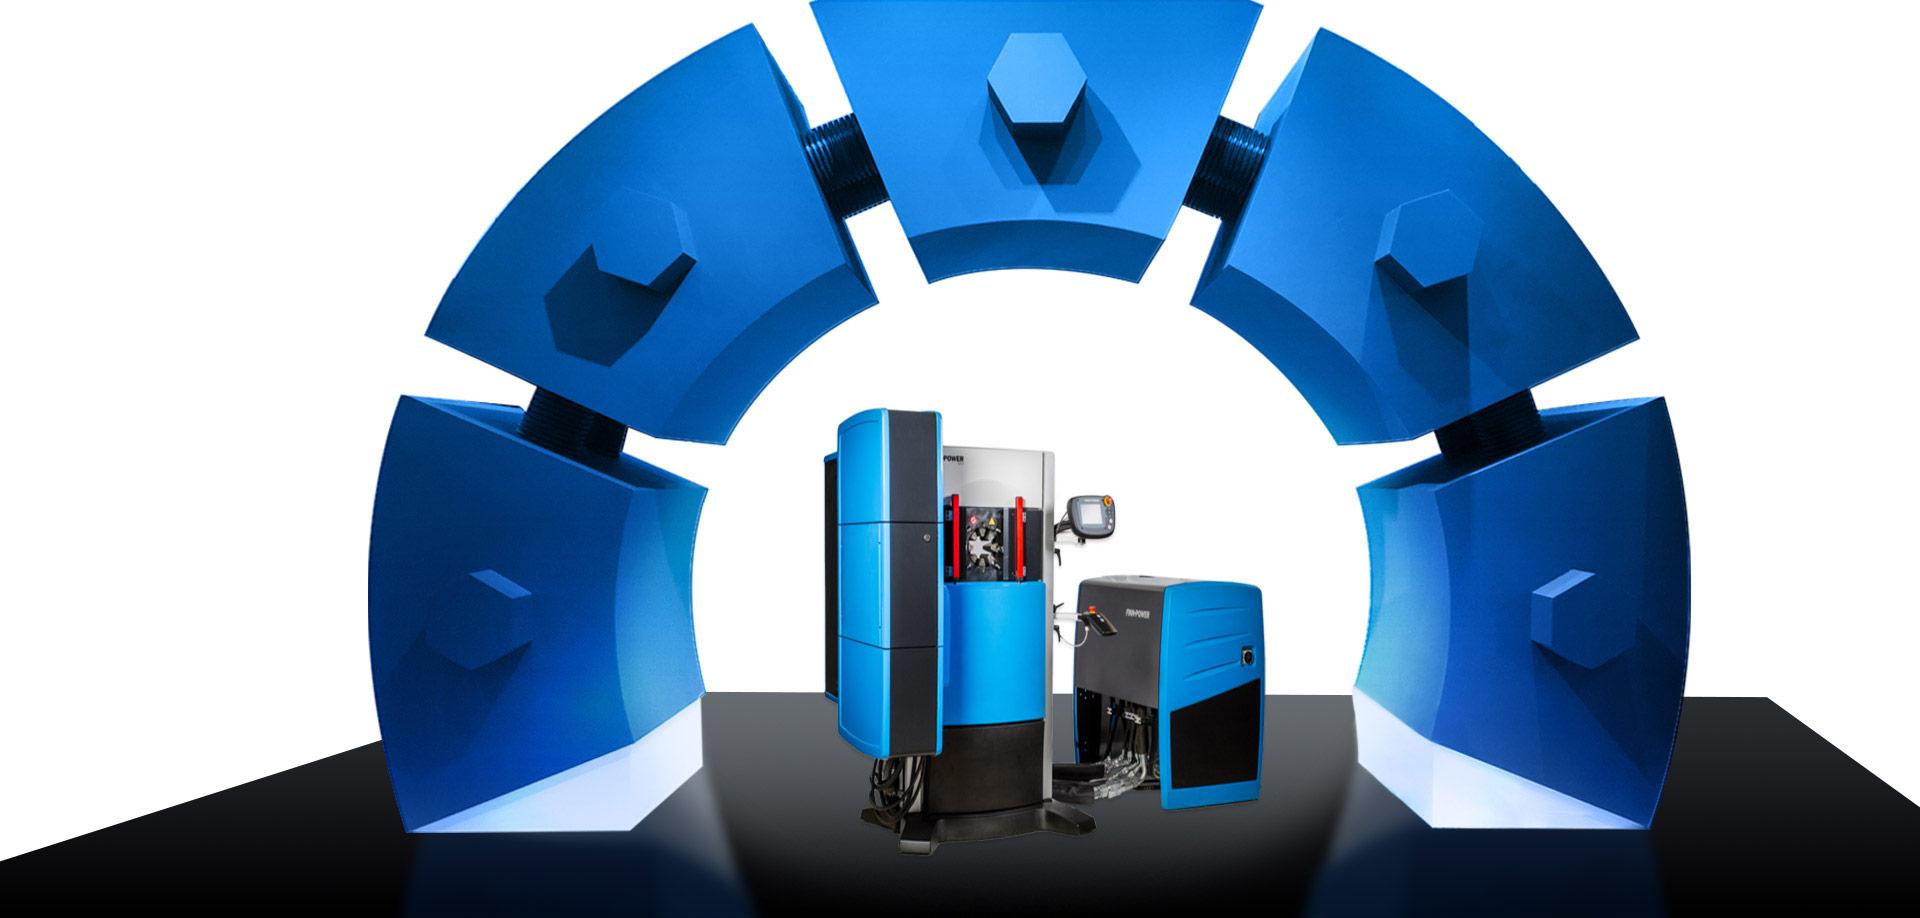 Gerritzen GmbH Schlauch-, Rohr und Blechbearbeitungsmaschinen